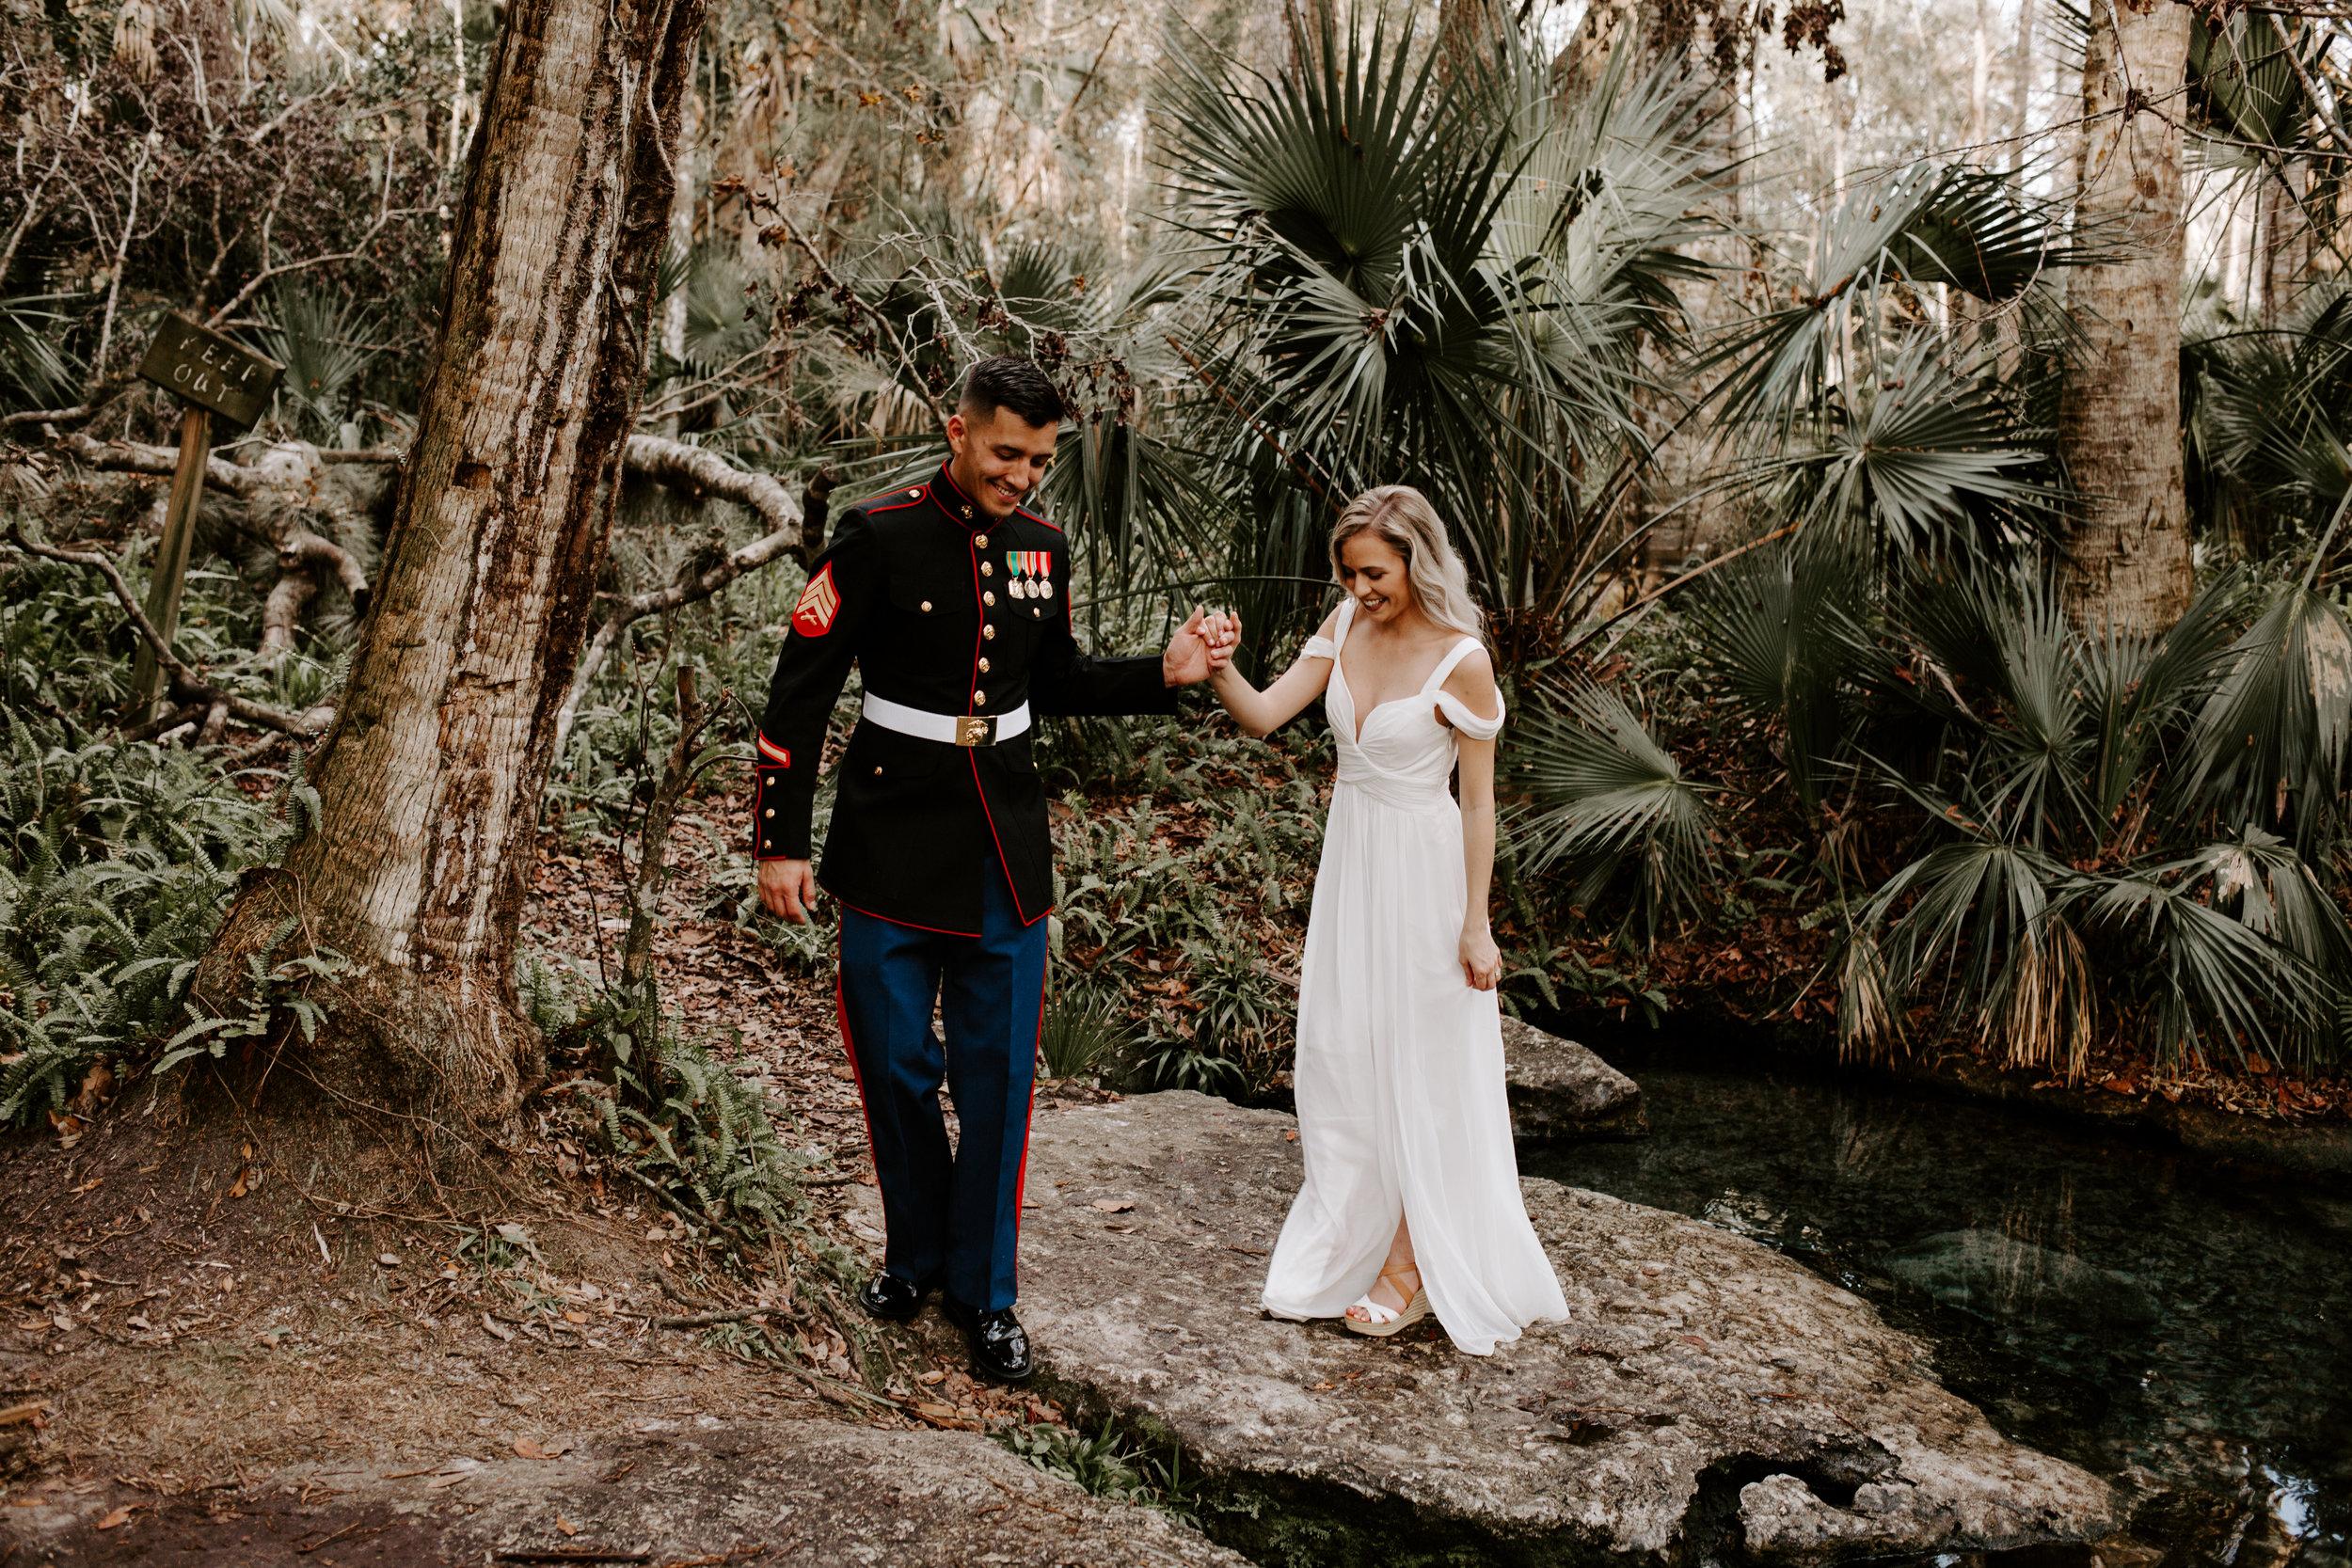 Zach&Jaclyn-Engagement-PHOTOSWITHJILL-80.jpg